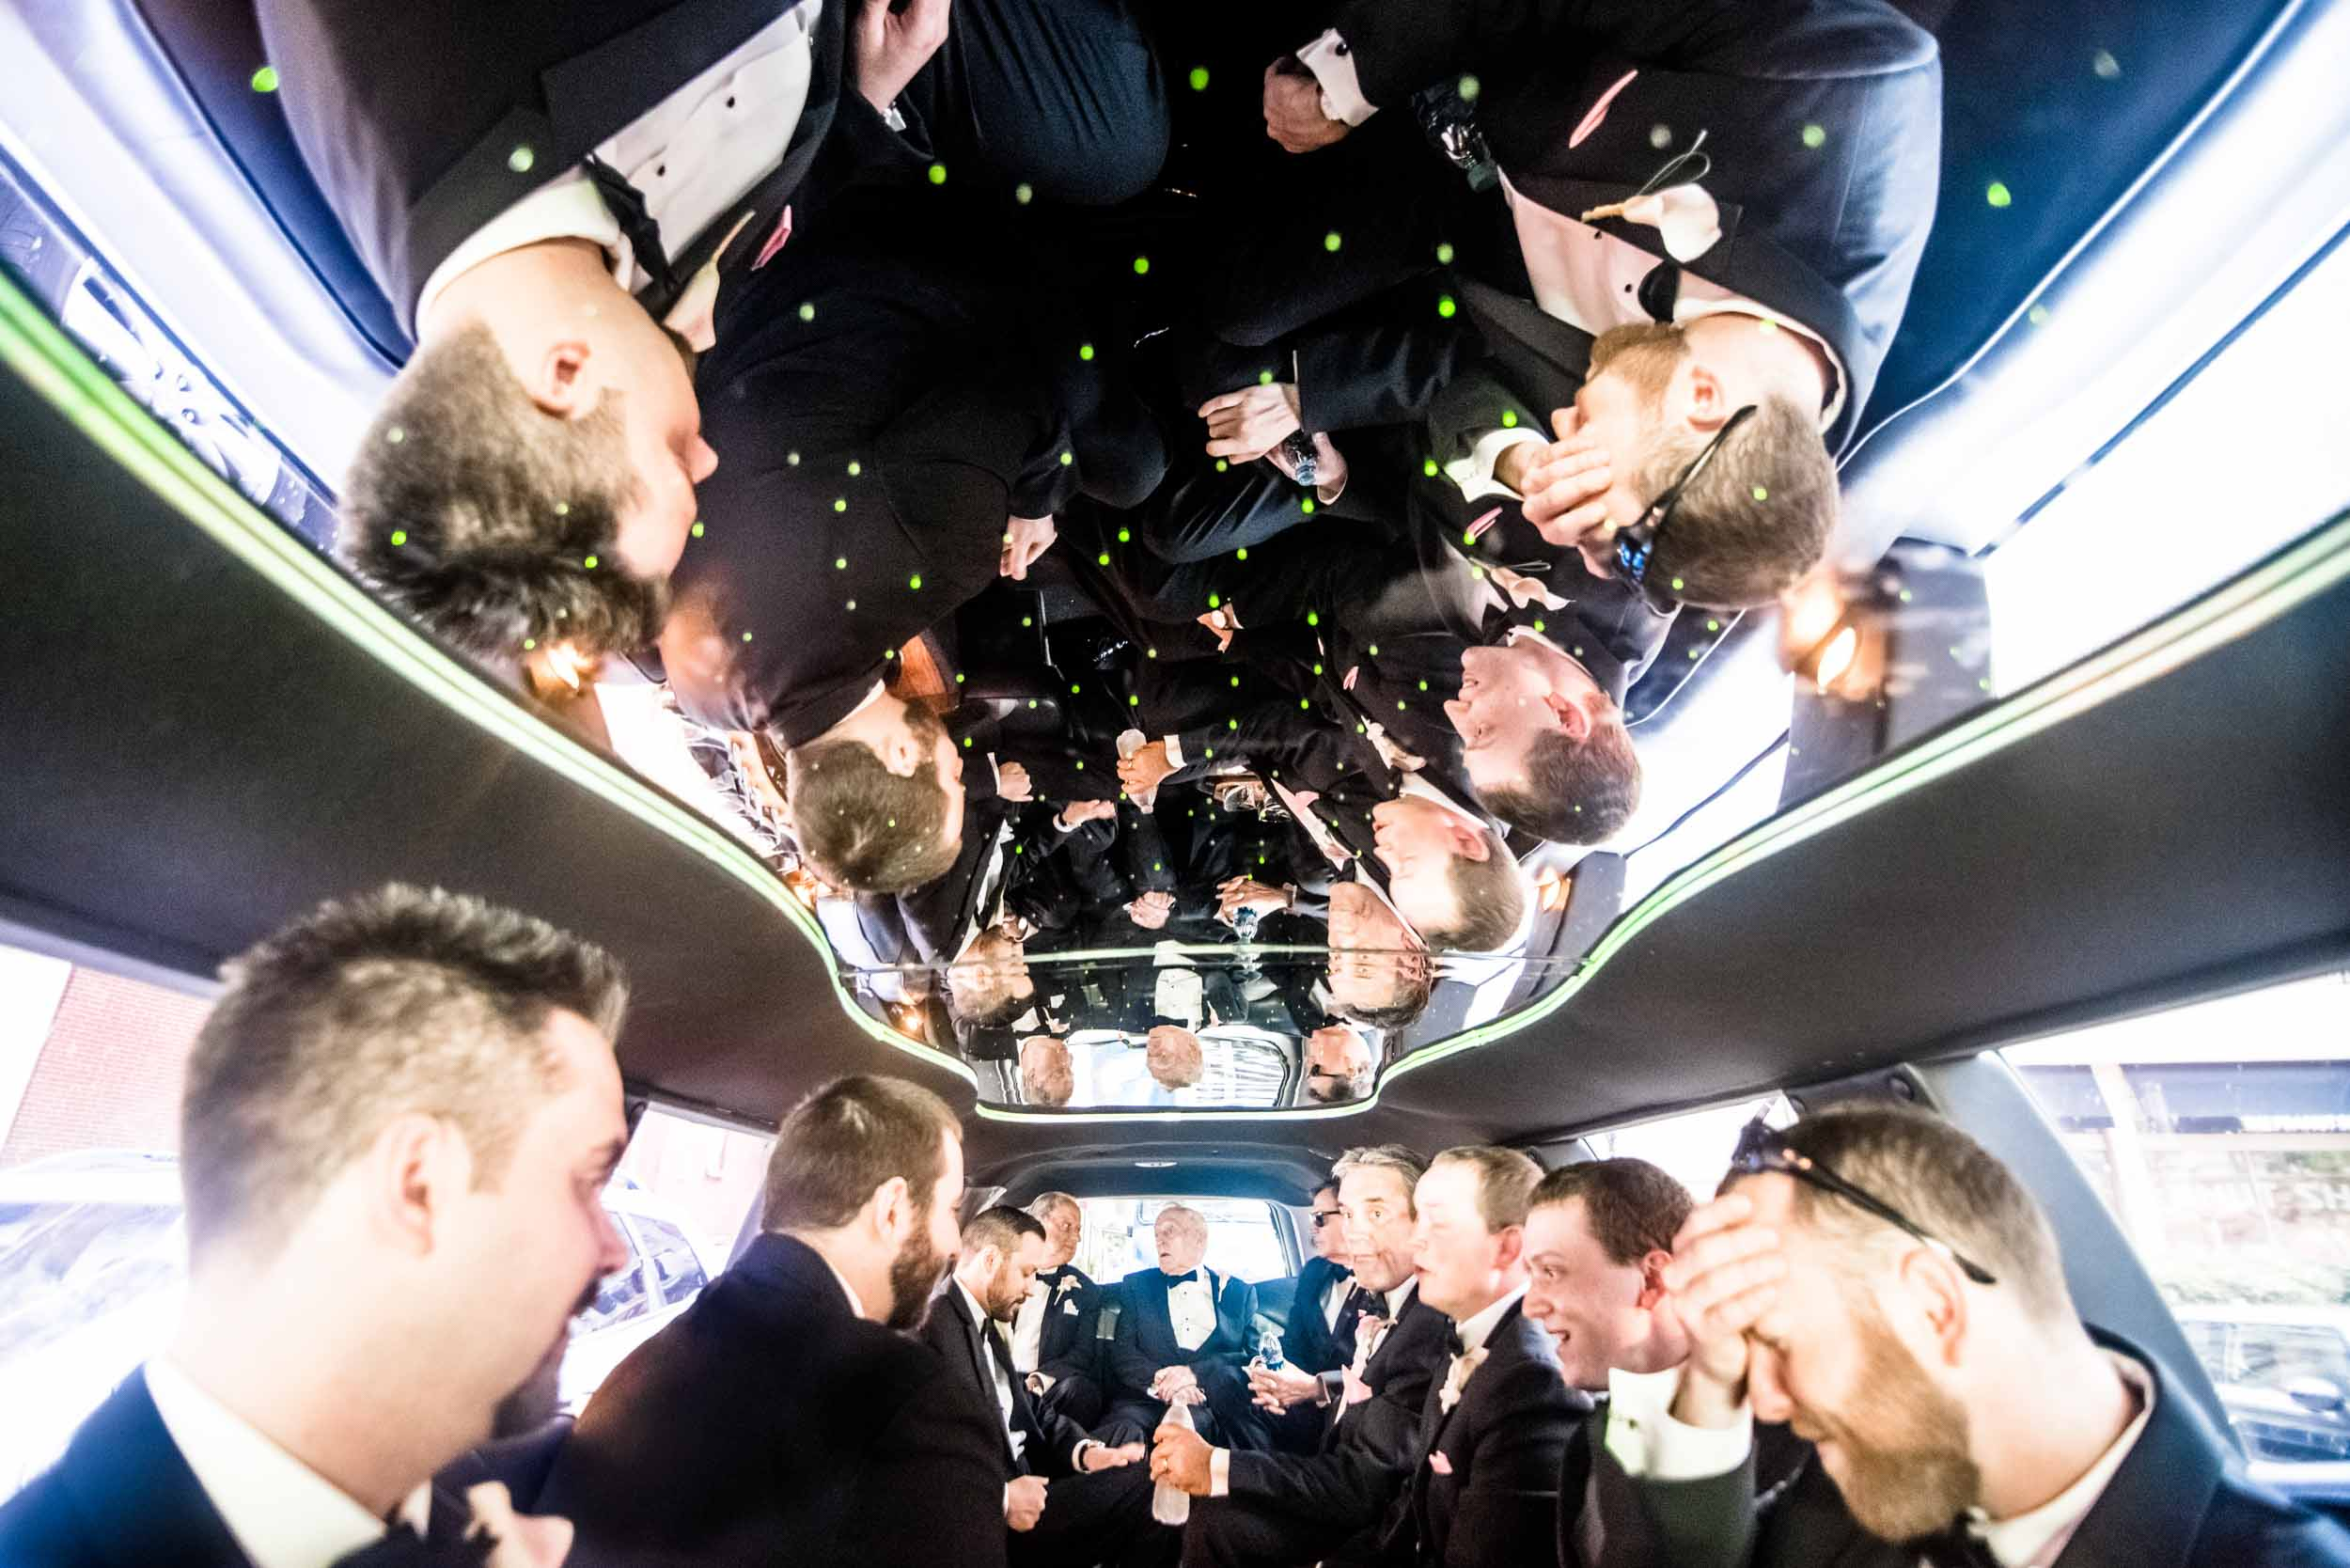 dc+metro+wedding+photographer+vadym+guliuk+photography+weddings+groomsmen-2022.jpg